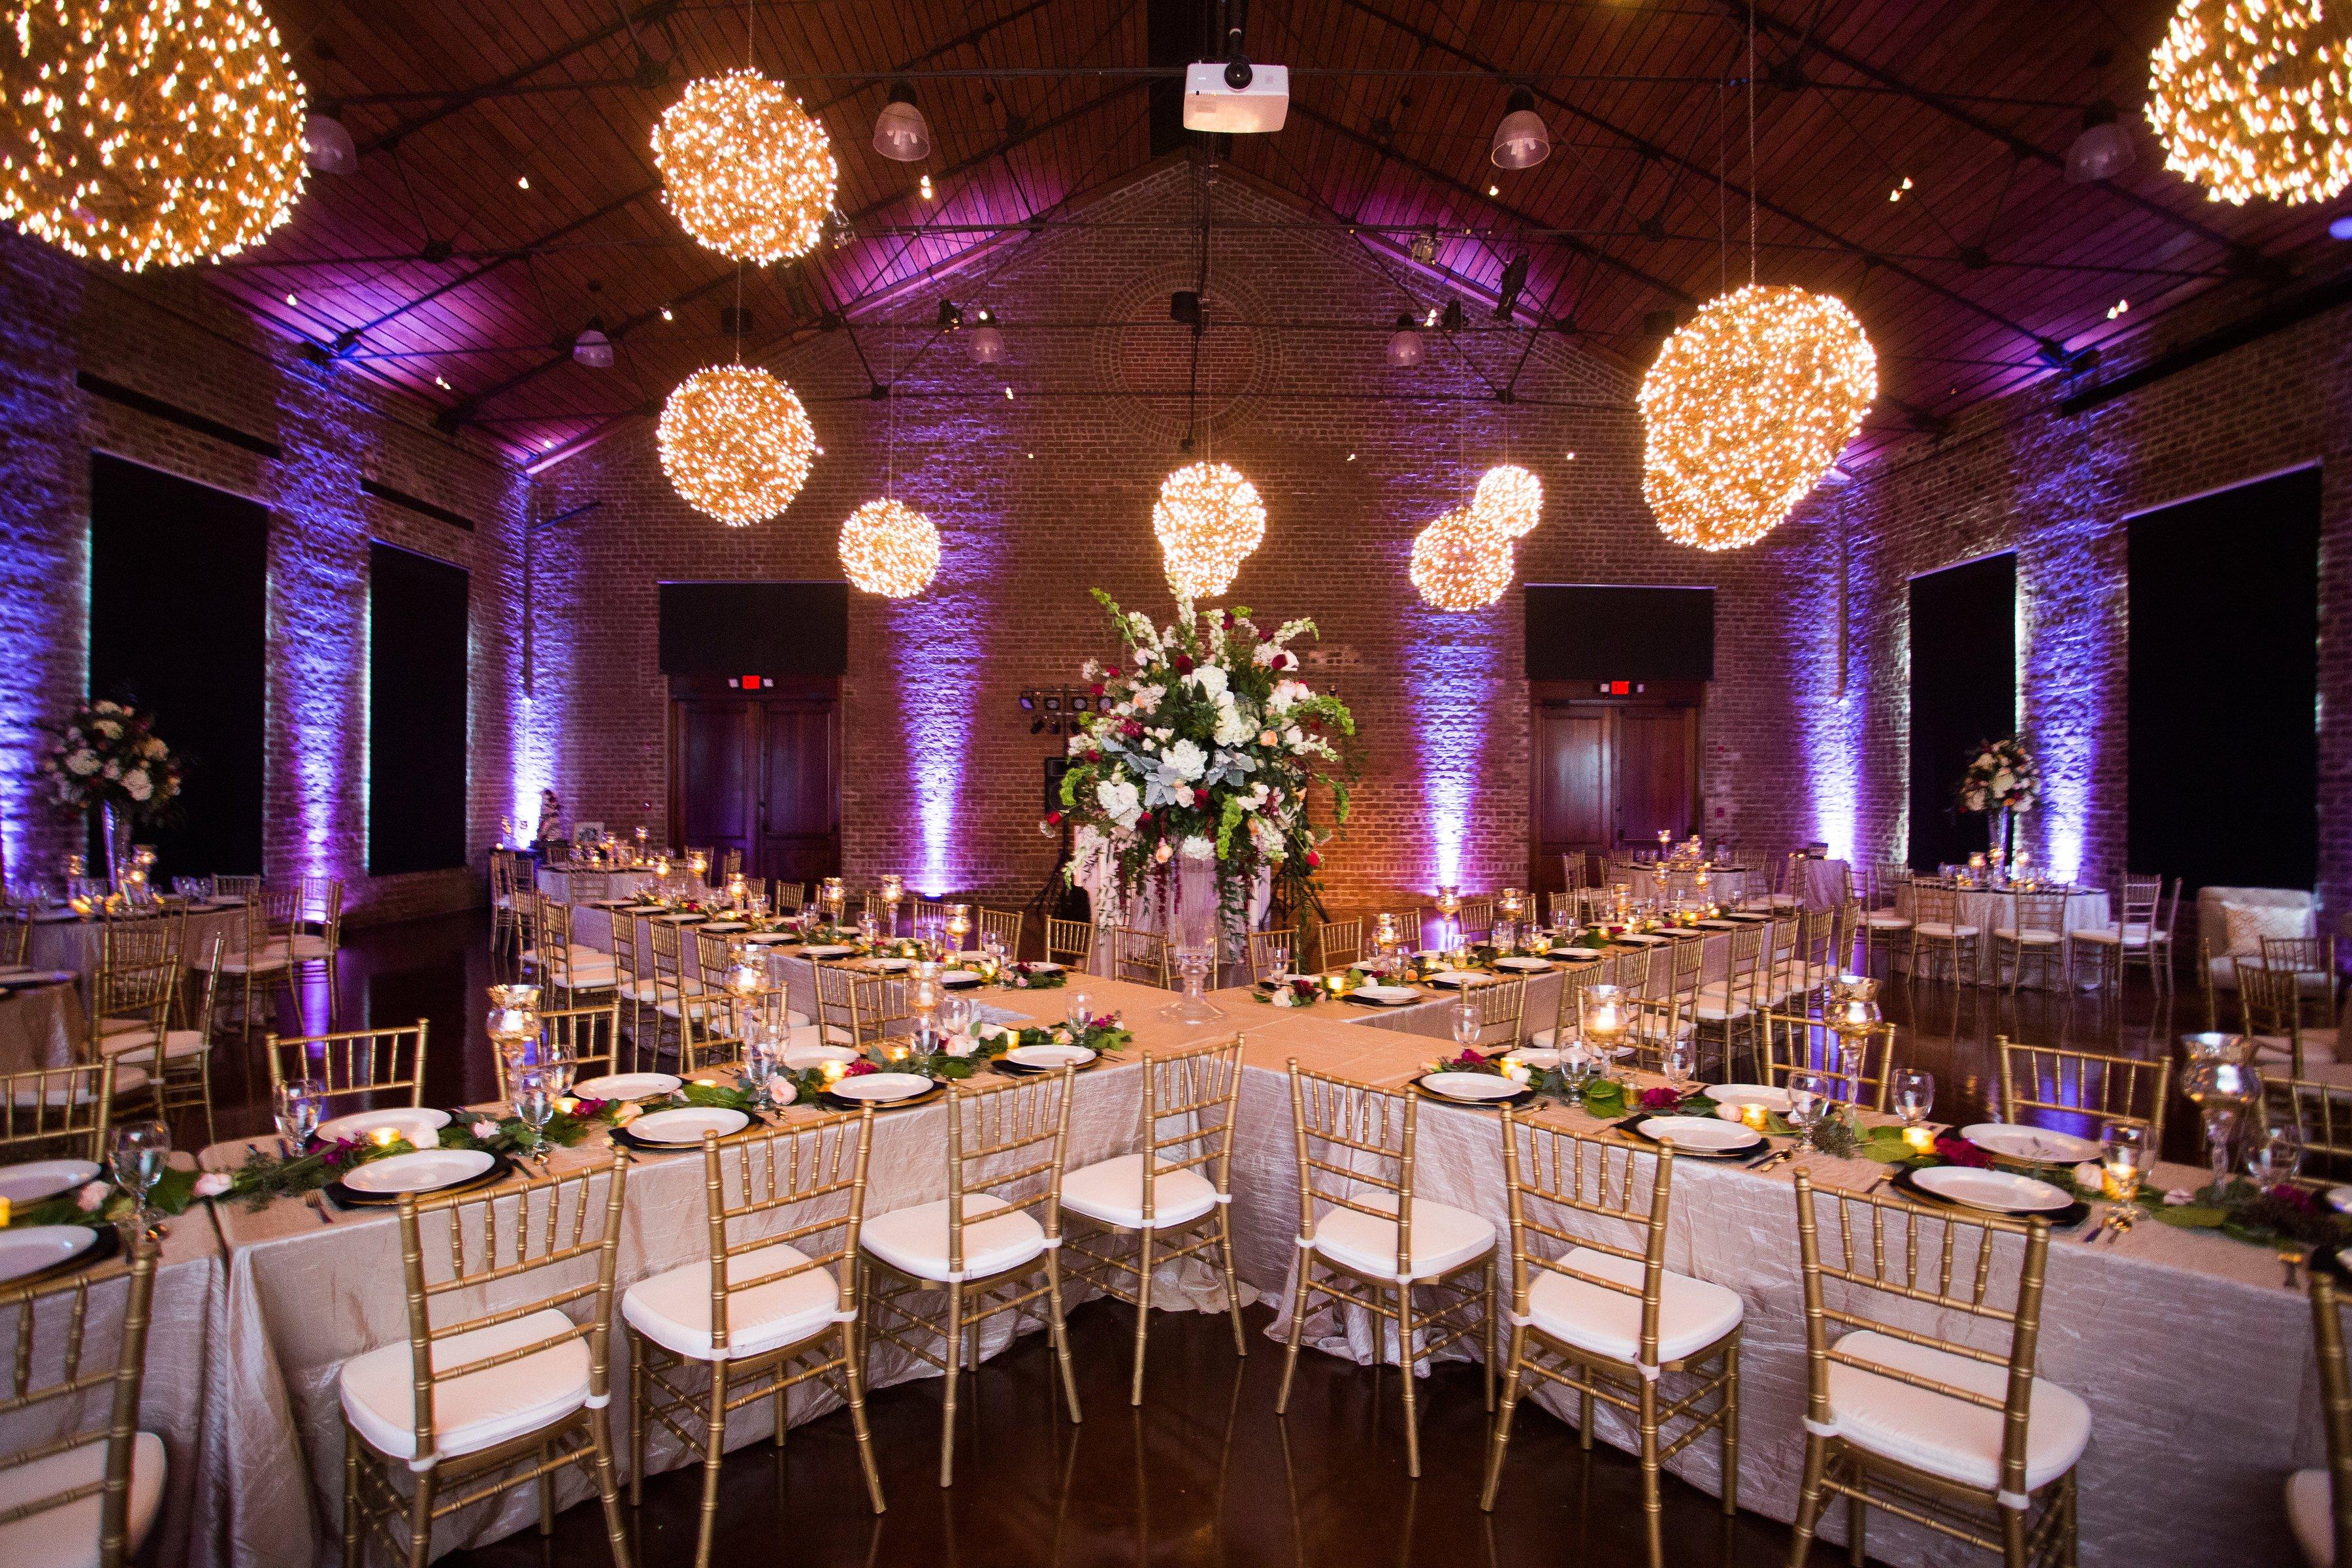 charles-morris-wedding-photo-mg(696).jpg